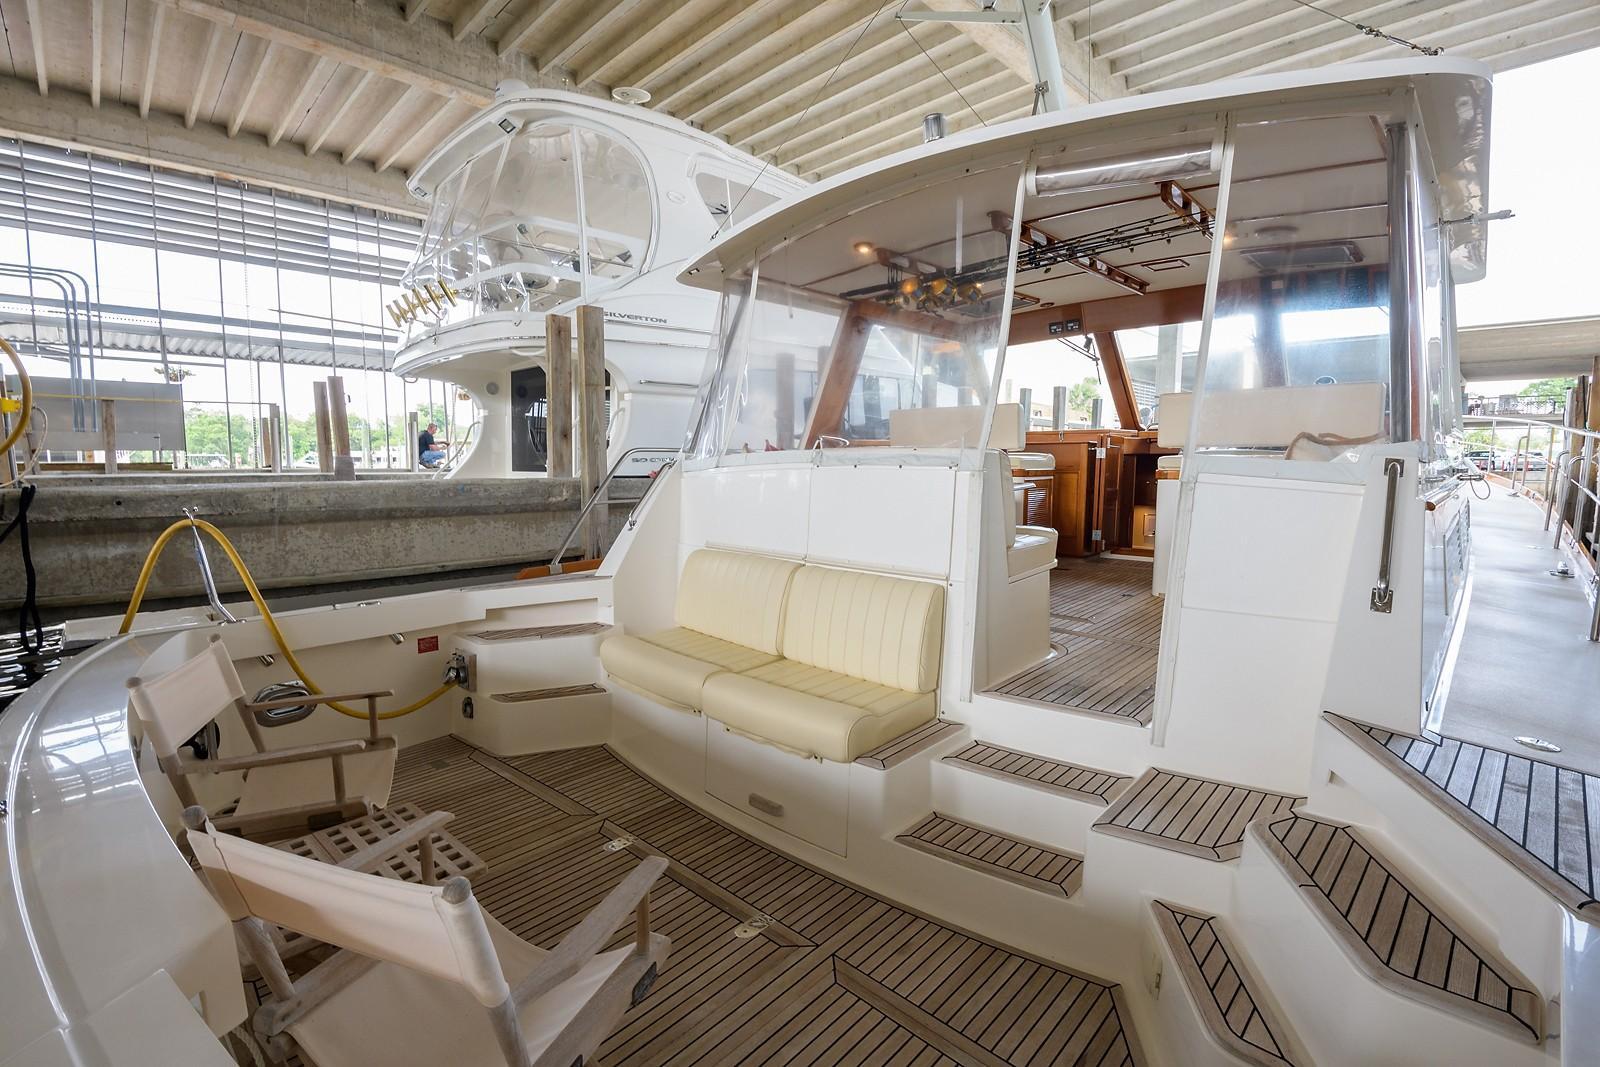 Cockpit, FWD, Port